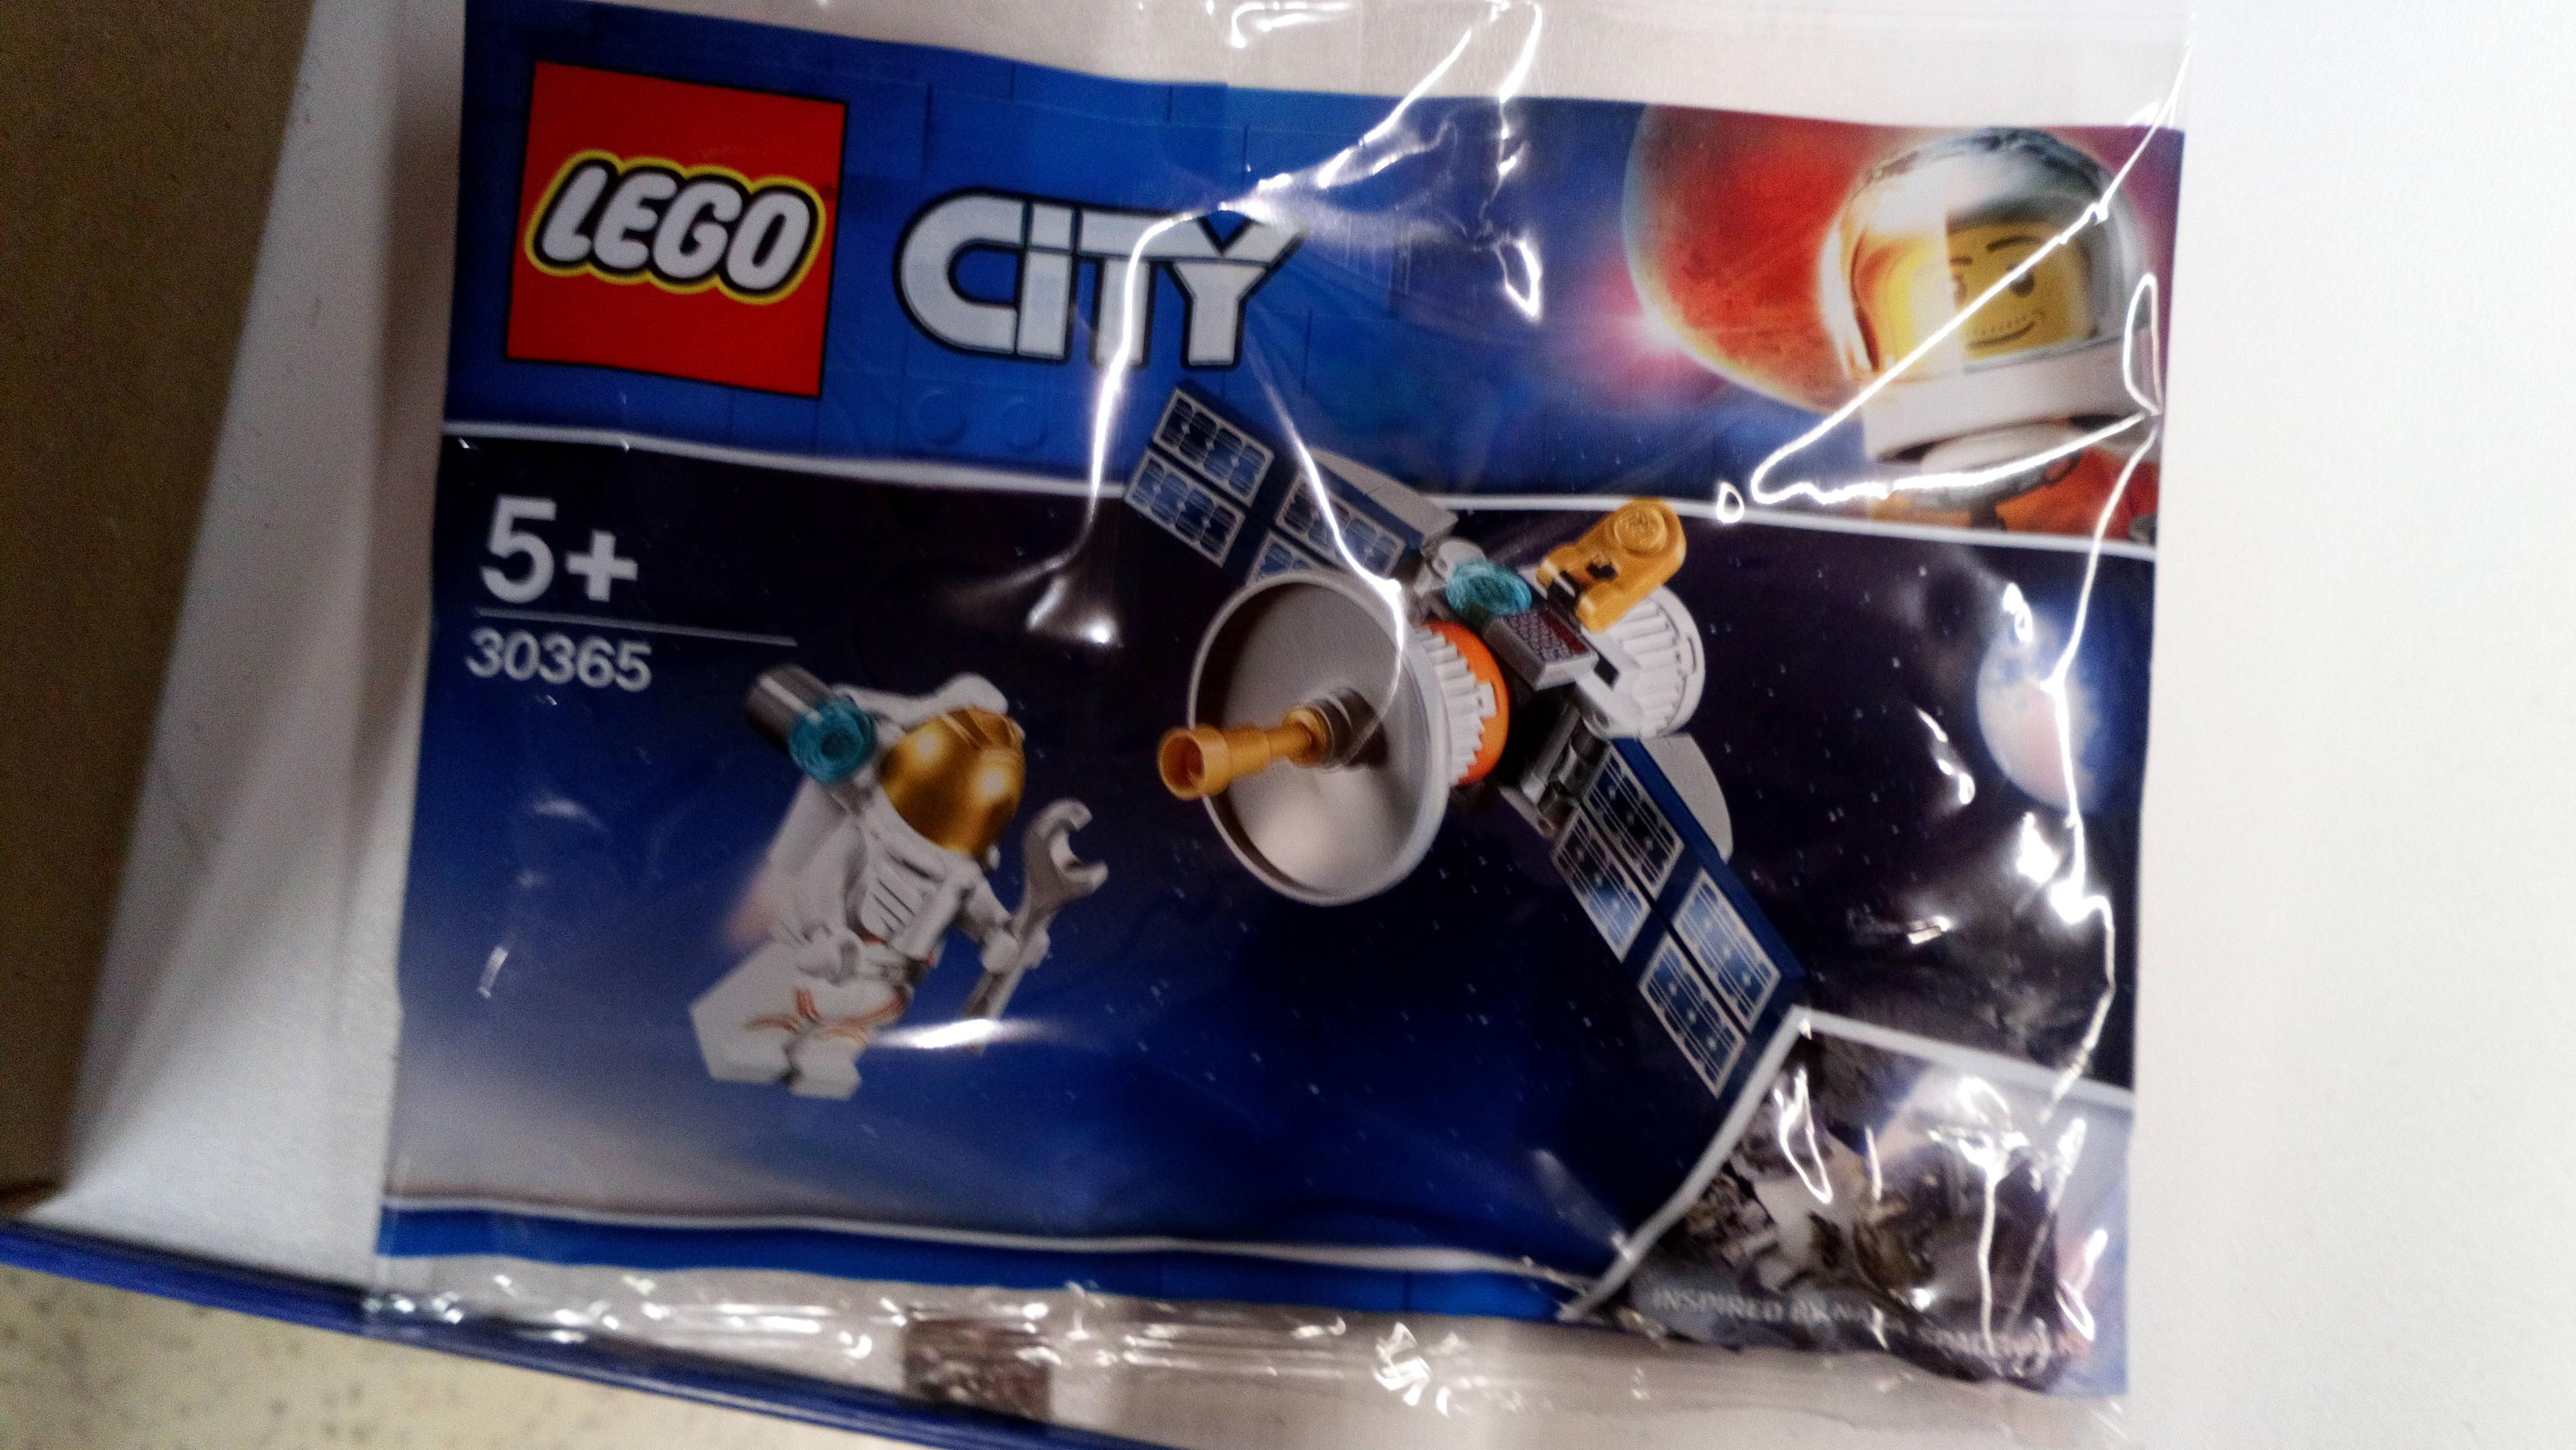 Lego City Mars Exploration Satellite 30365 Polybag Found